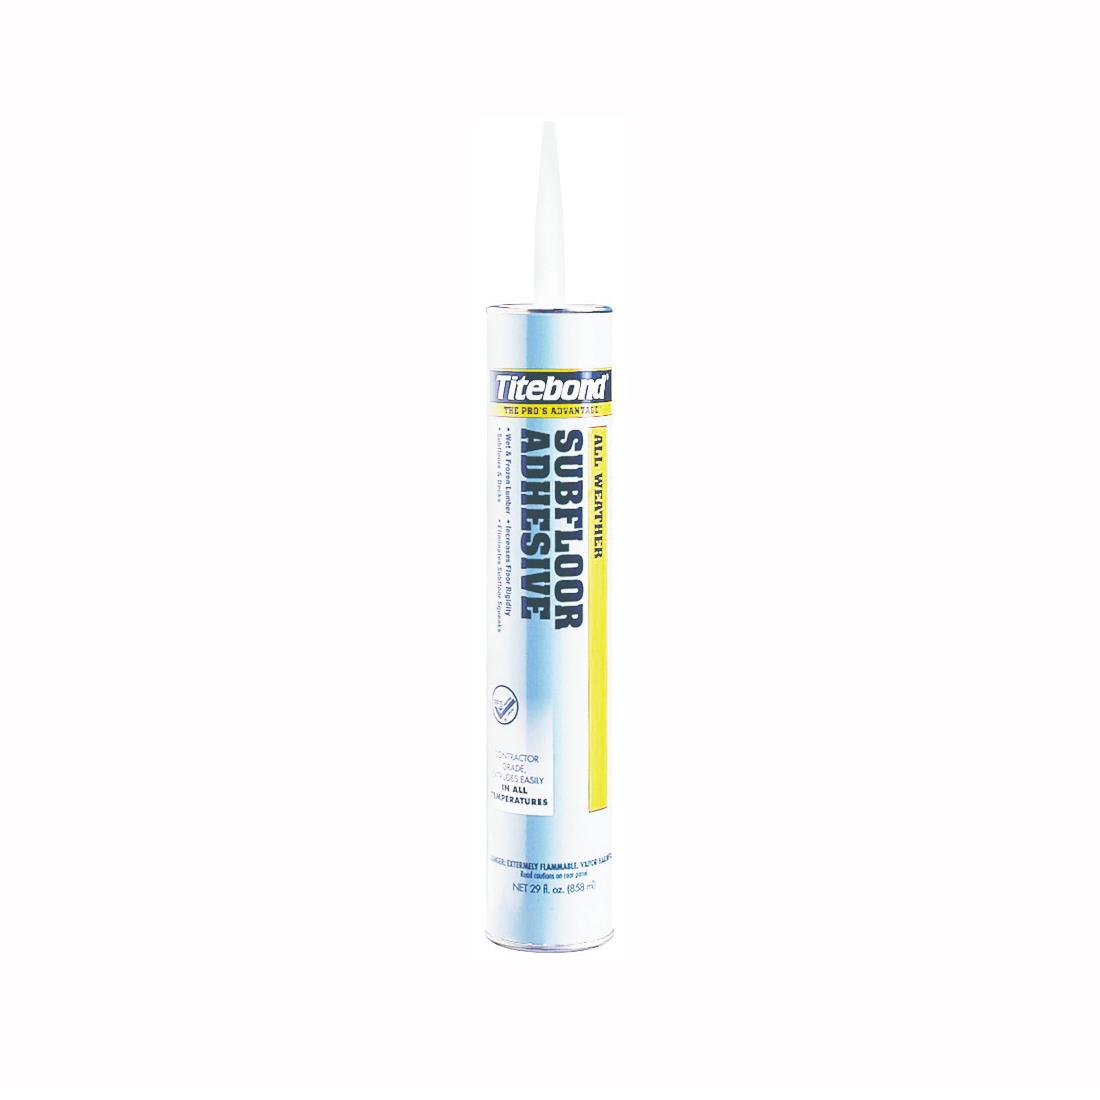 Picture of Titebond 5492 Subfloor Adhesive, Light Tan, 28 oz Package, Cartridge